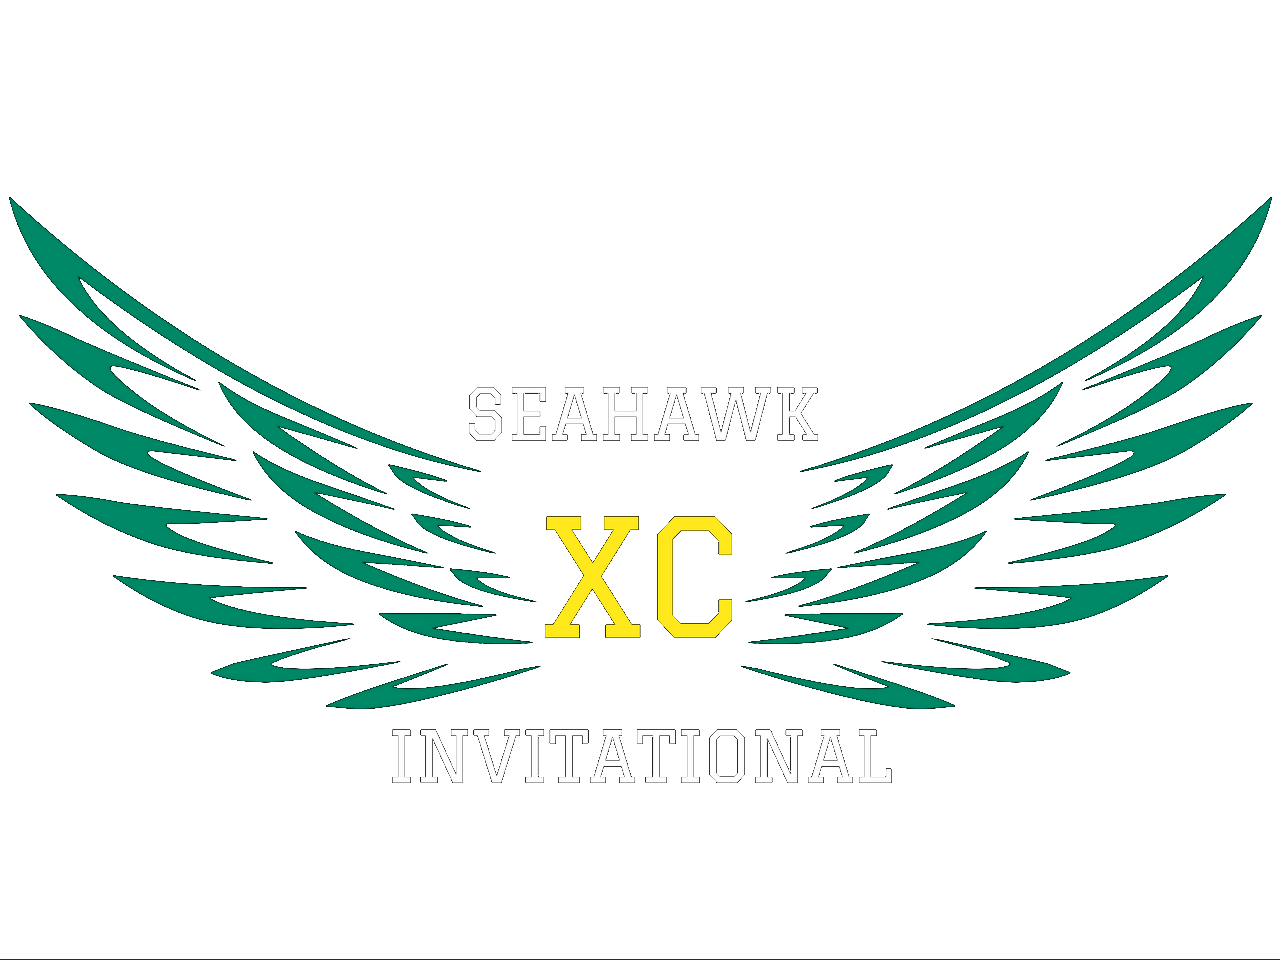 seahawk logo fin clear